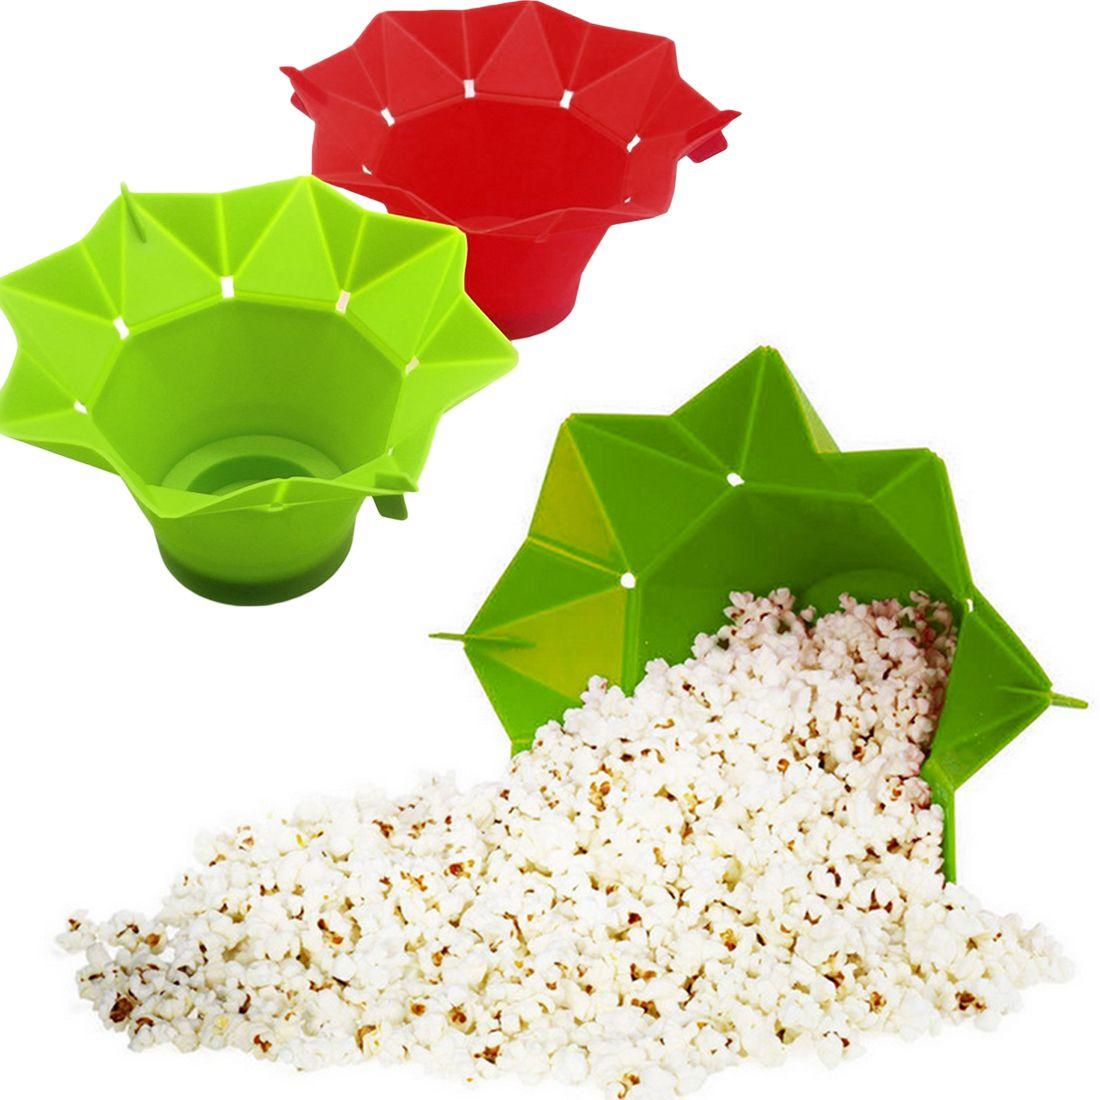 Silicone Vermelho Verde Popcorn Bowl Home Microwavable Pop Milk Maker Bowl Microondas Cofre Cofre Pipoca Bucket 201214